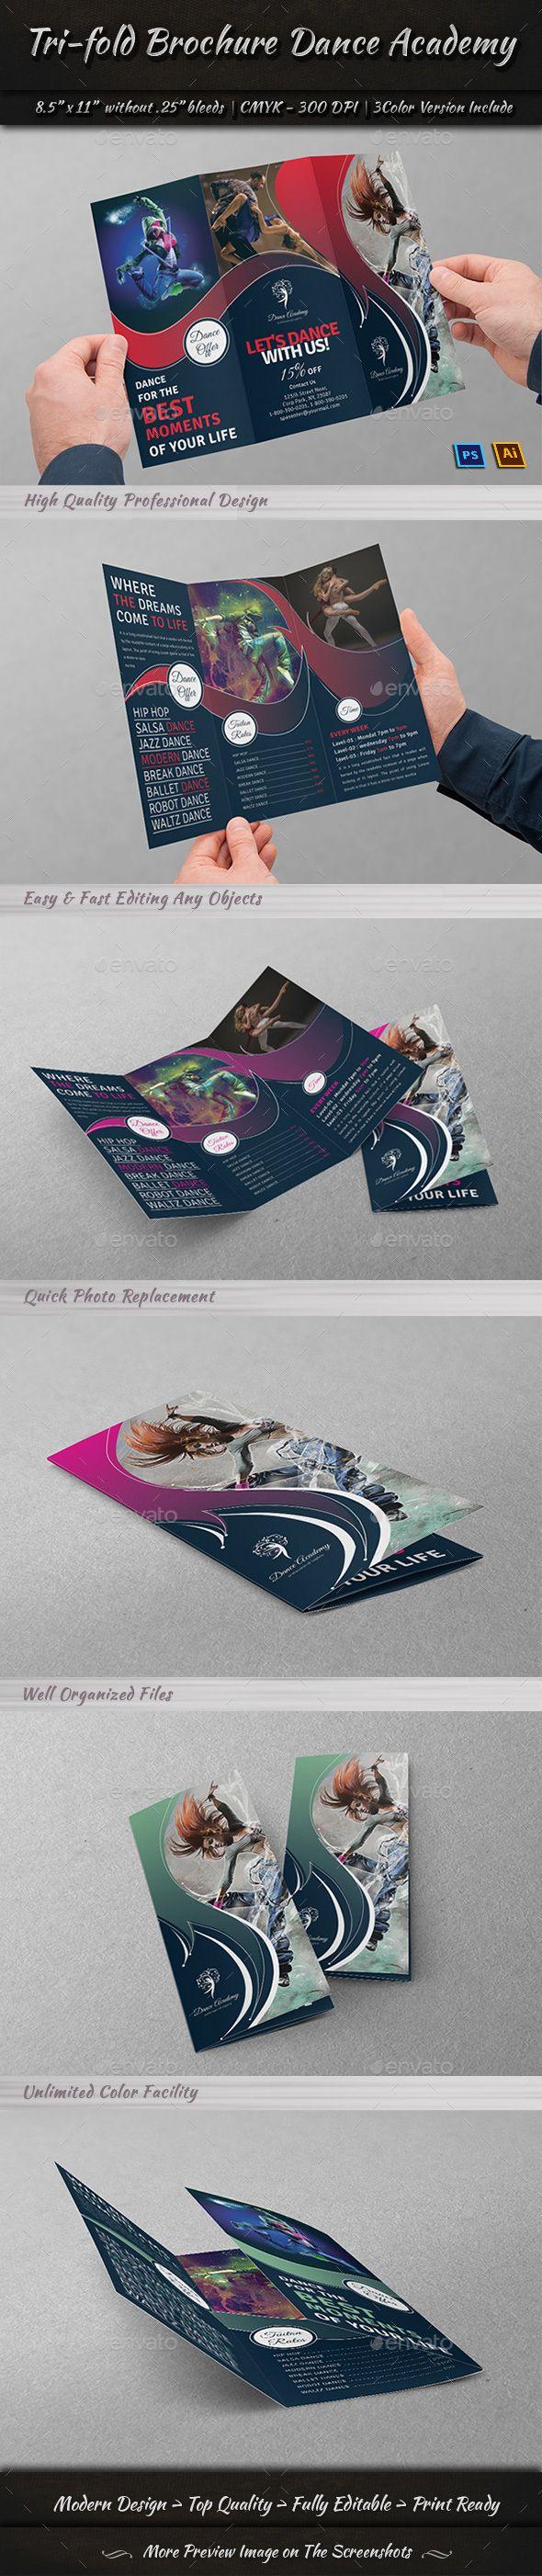 Tri-Fold Brochure Dance Academy